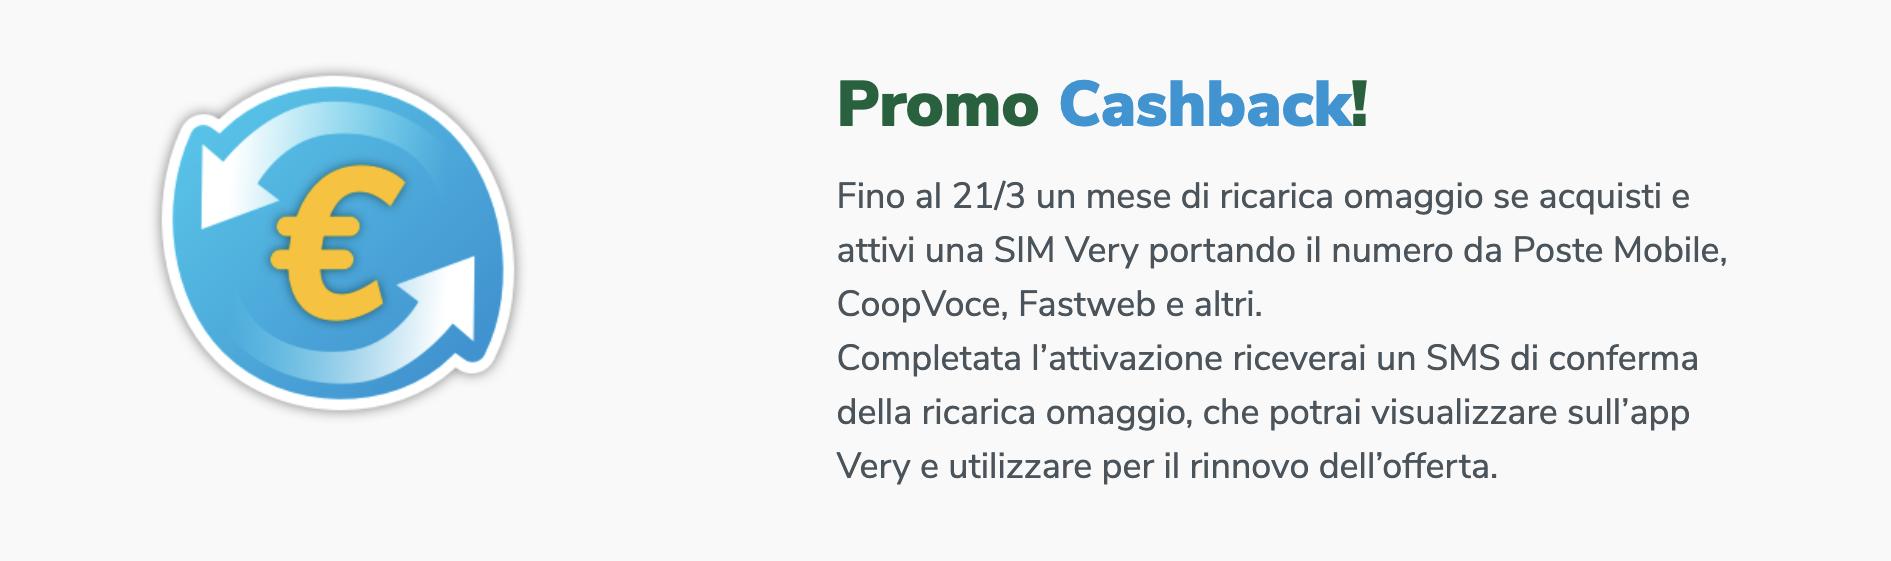 VeryMobile Promo Cashback